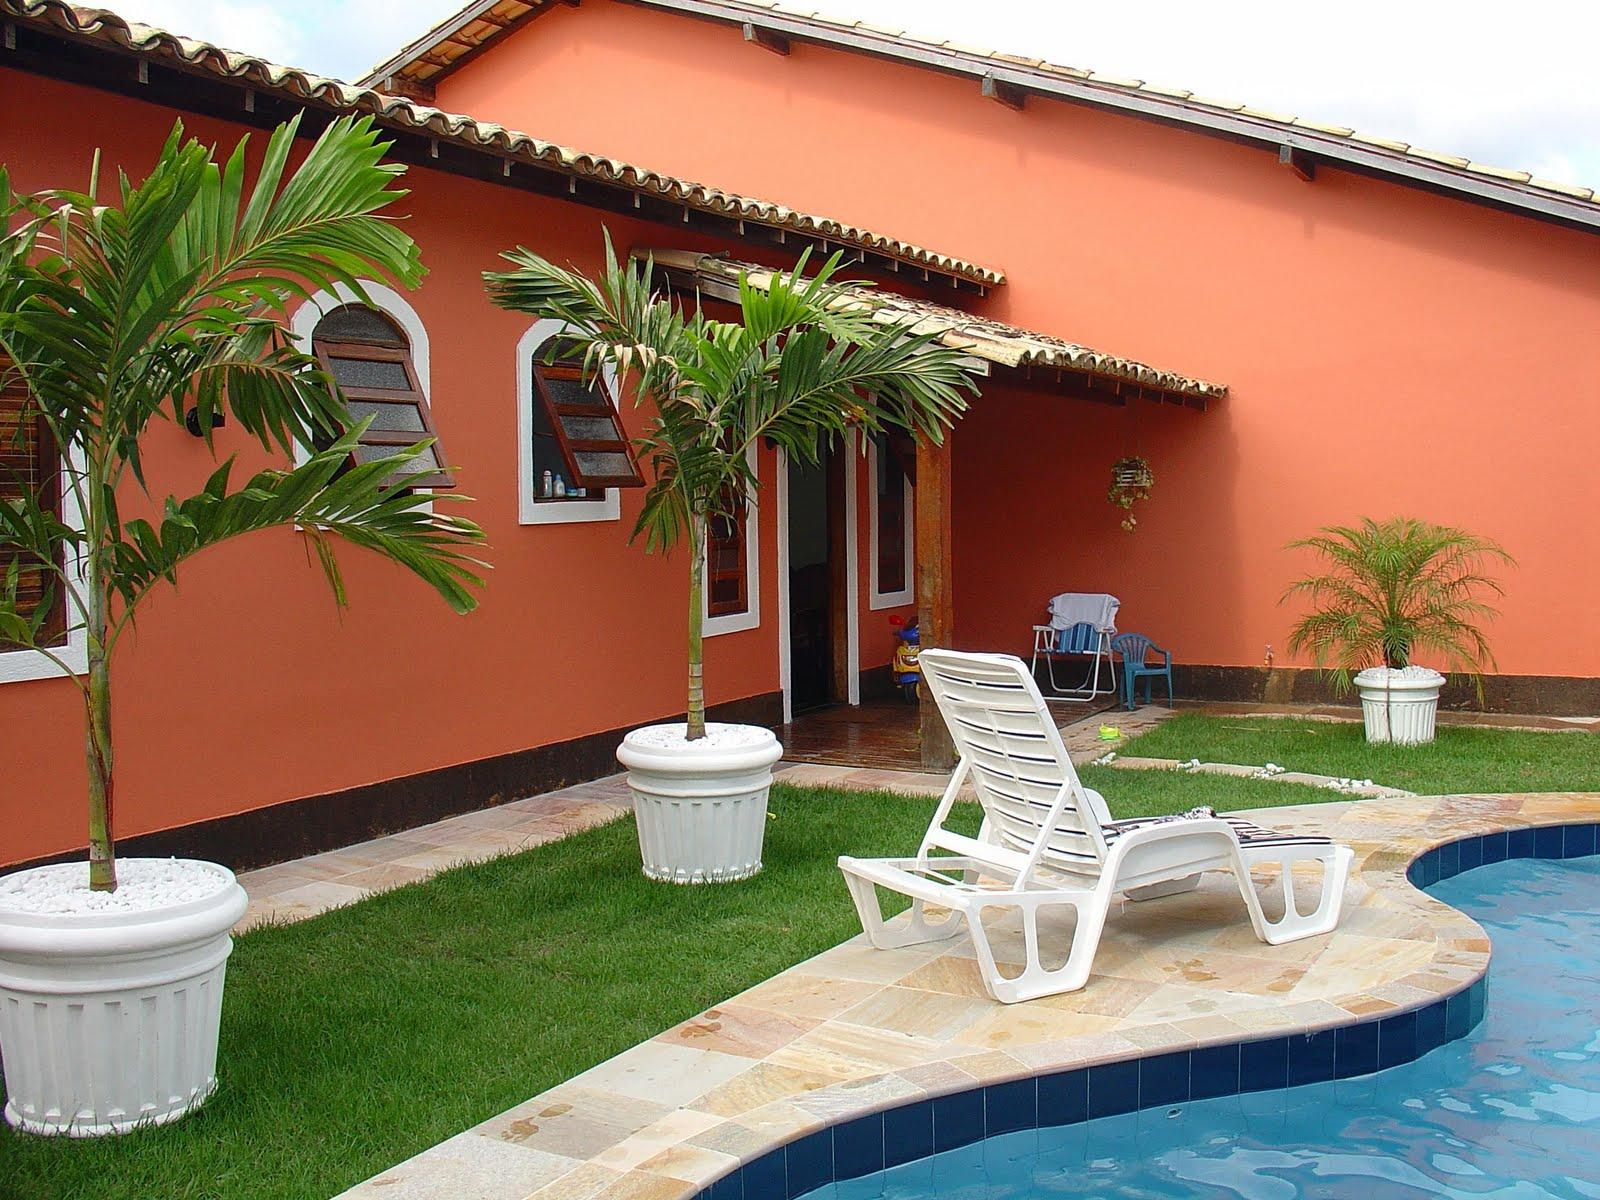 Investissement locatif acheter sa maison de vacances s te for Acheter sa maison